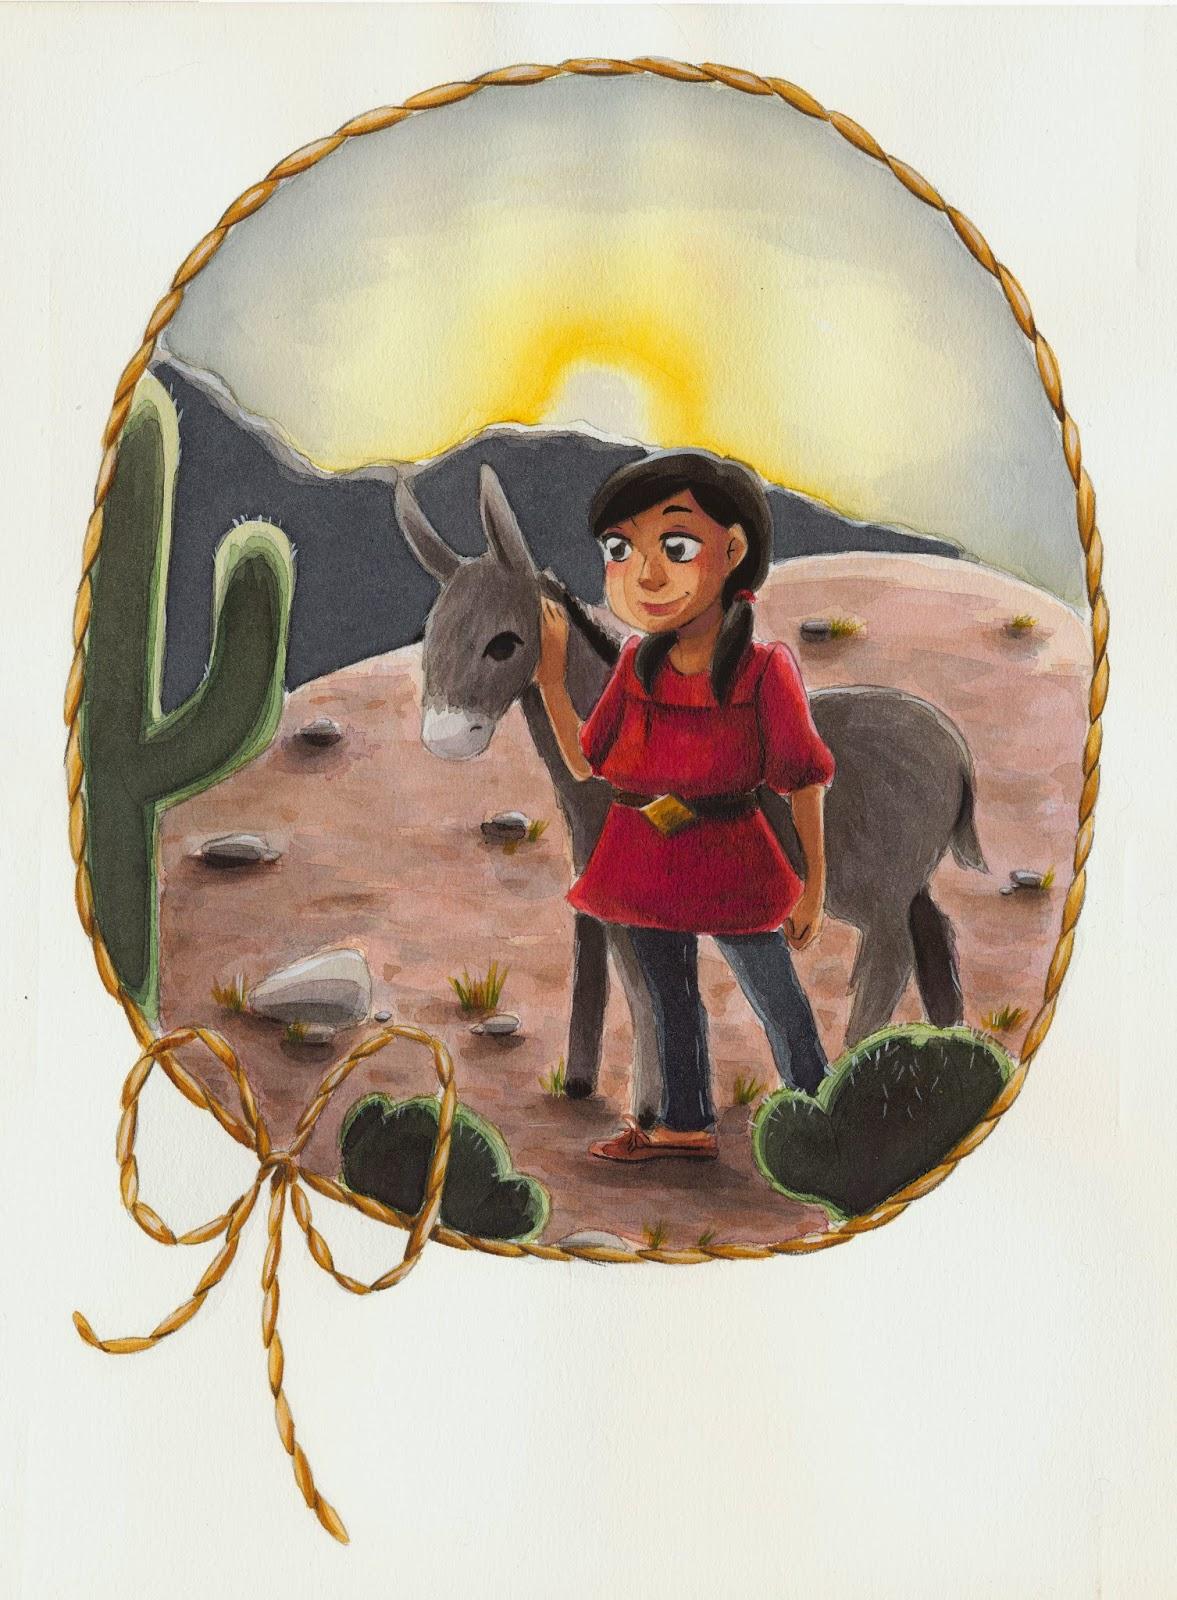 watercolor, Nattosoup Studio, burro, desert, painting, illustration